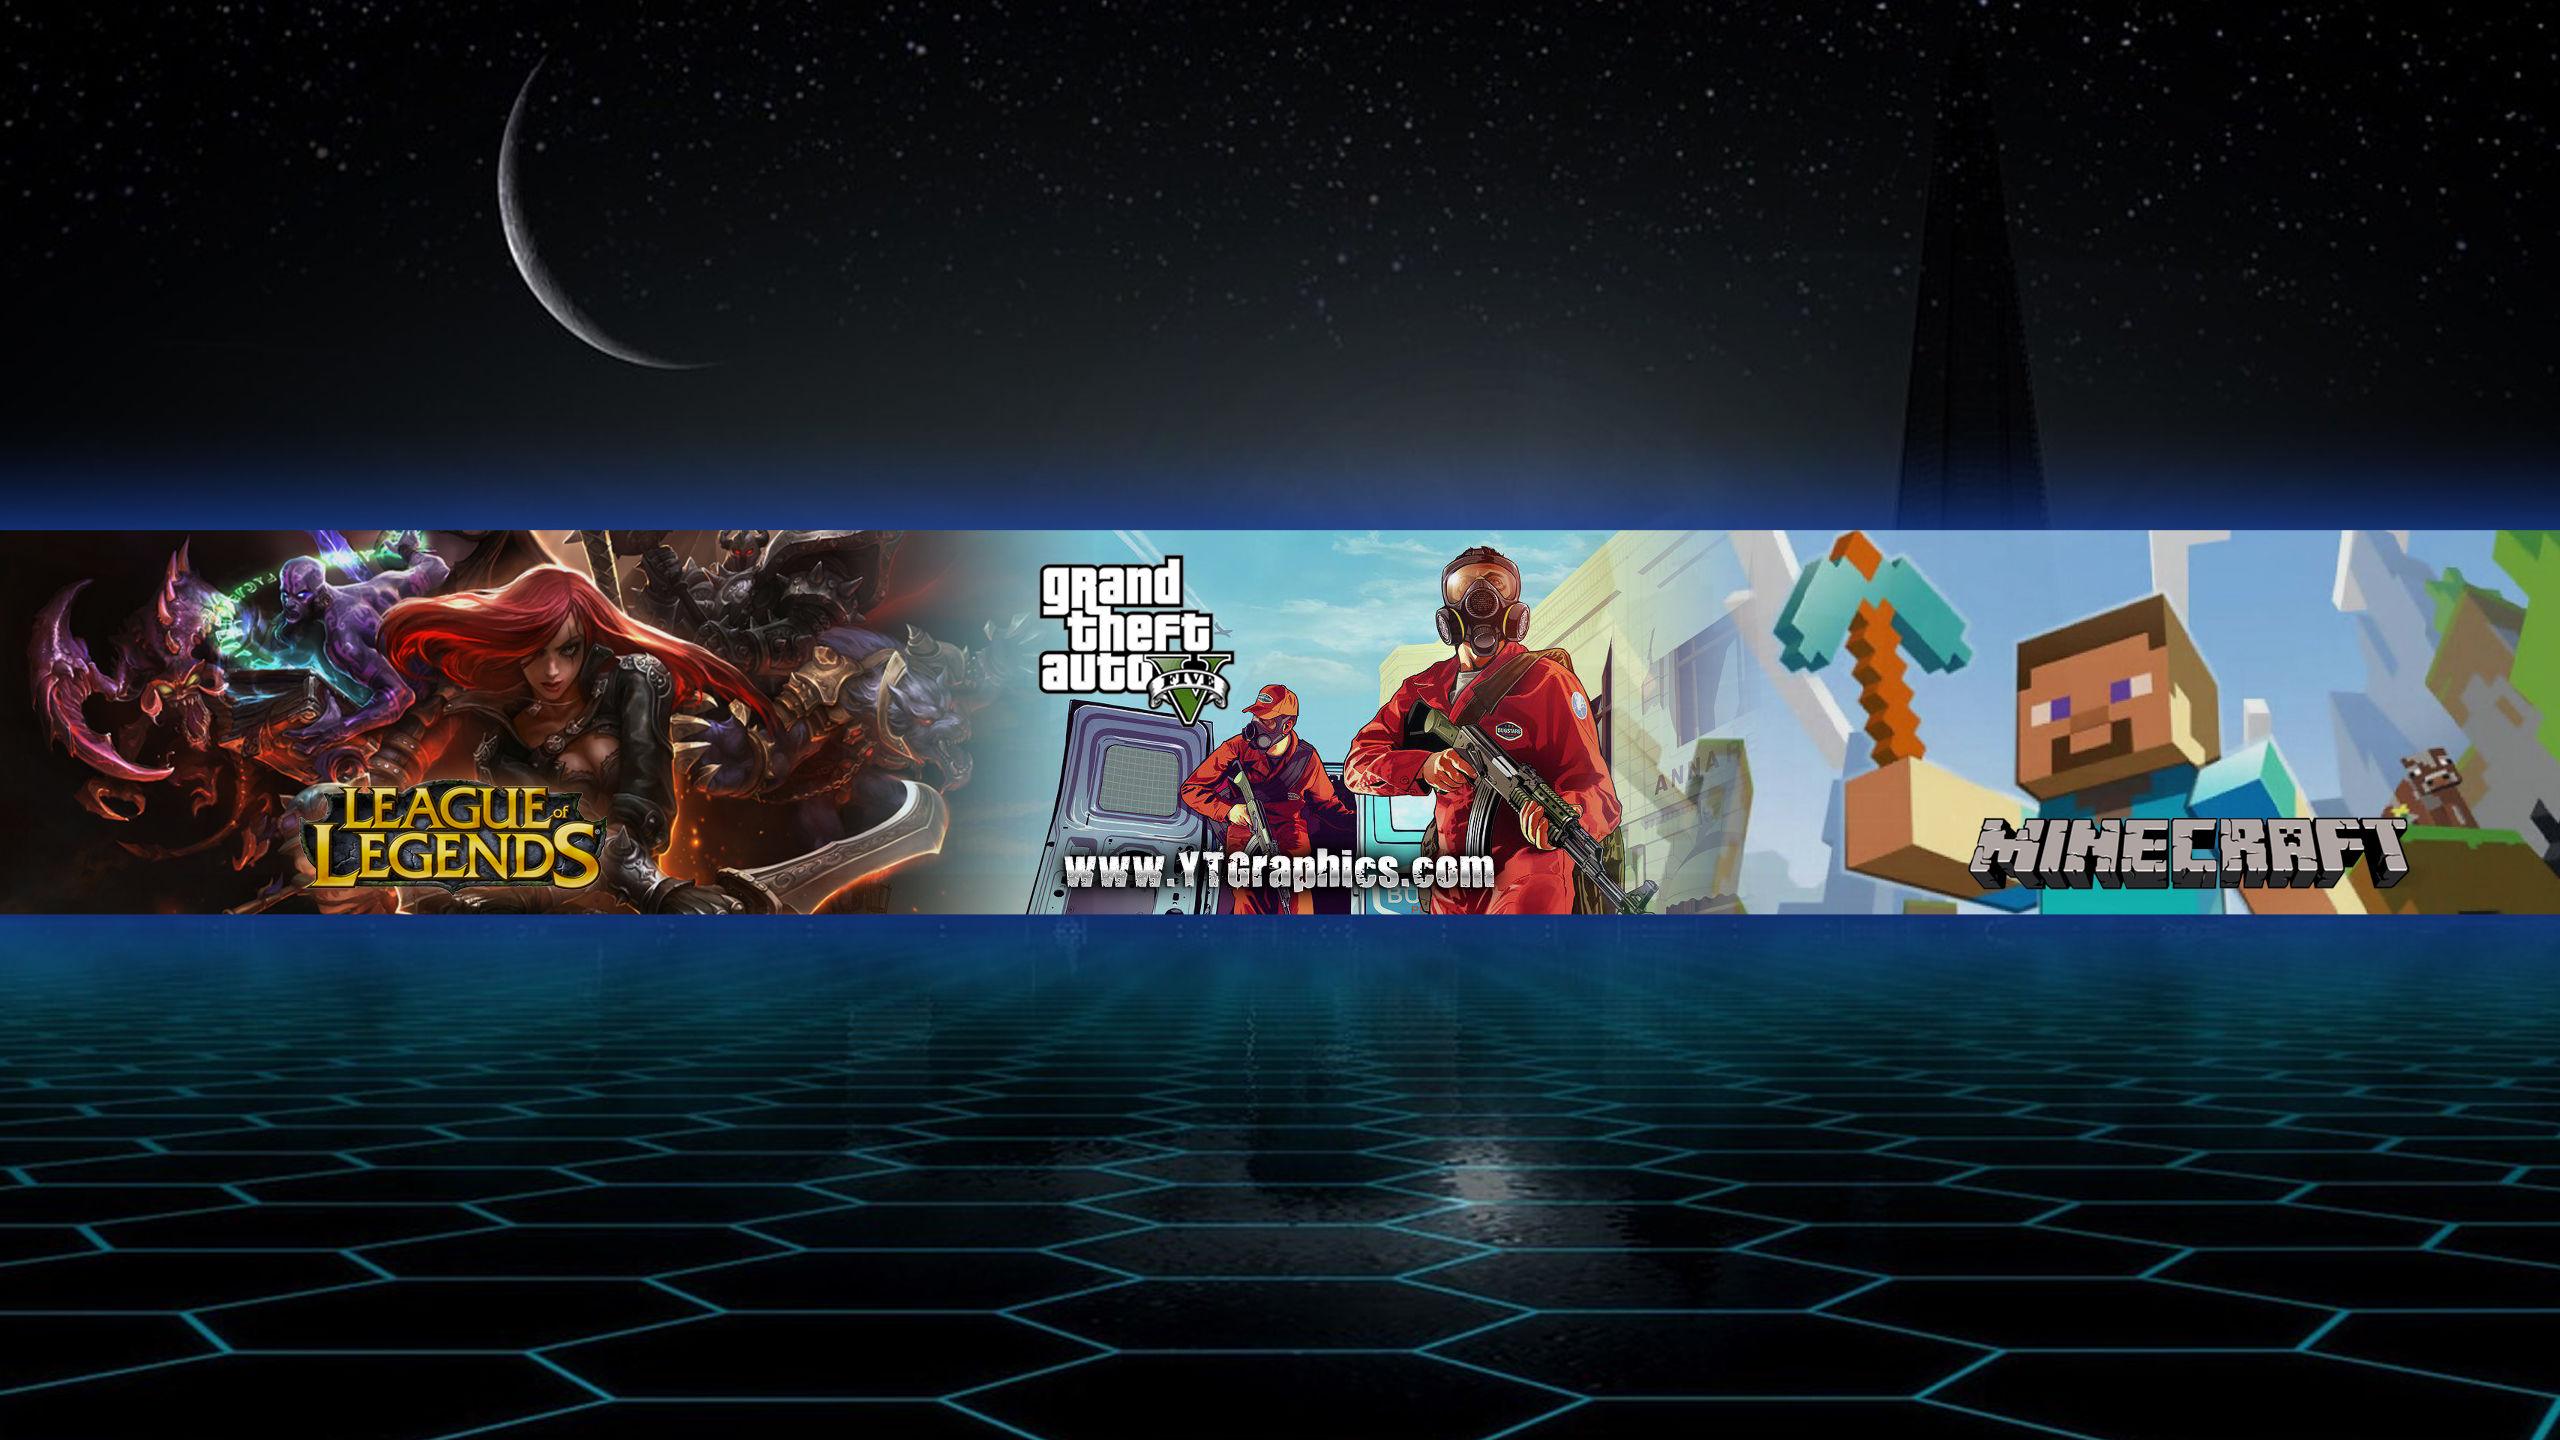 Mix Gta5 Lol Minecraft Youtube Channel Art Banner